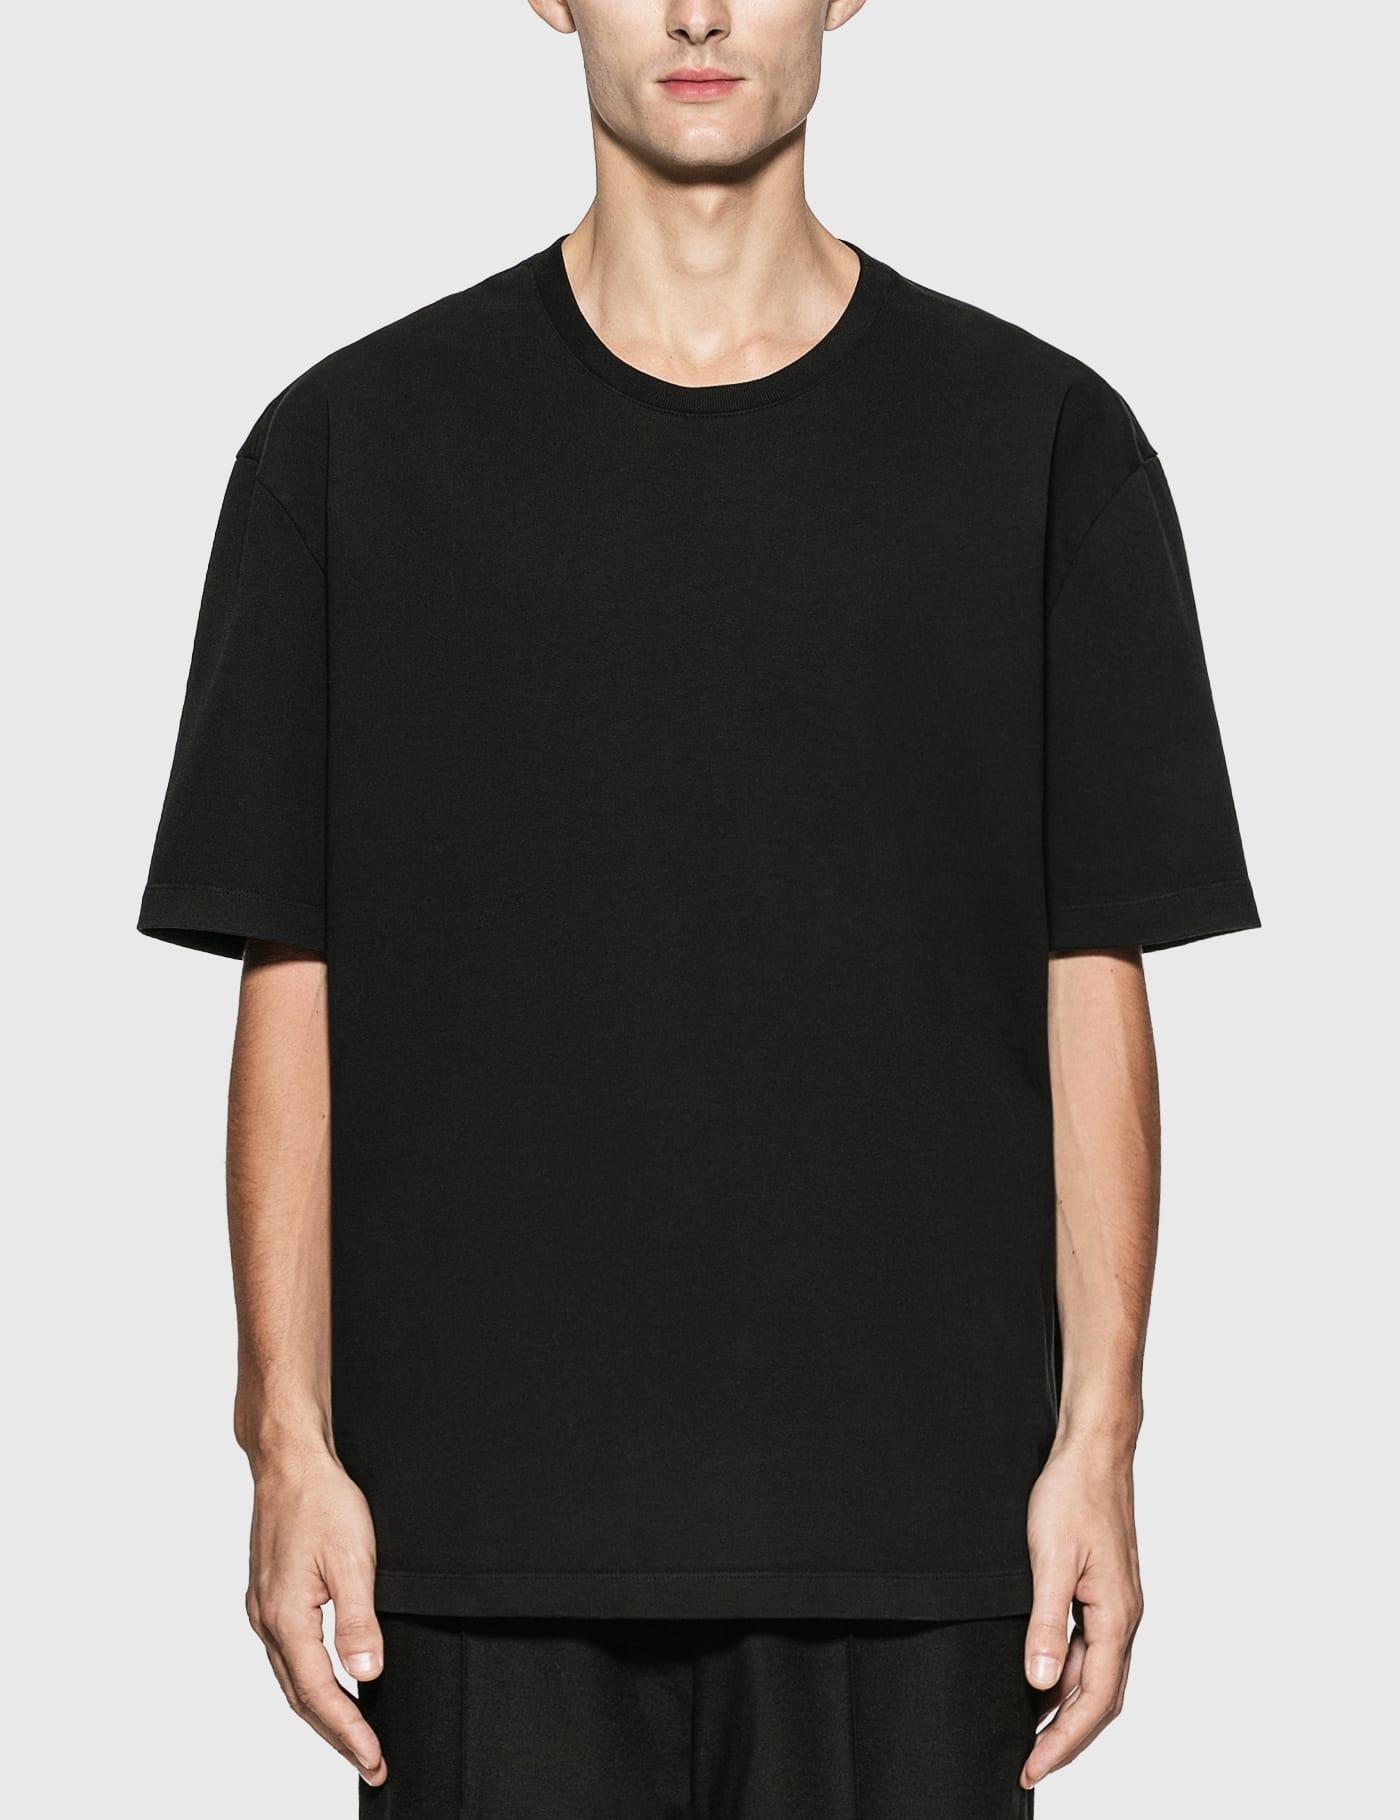 Garment Dyed T-Shirt